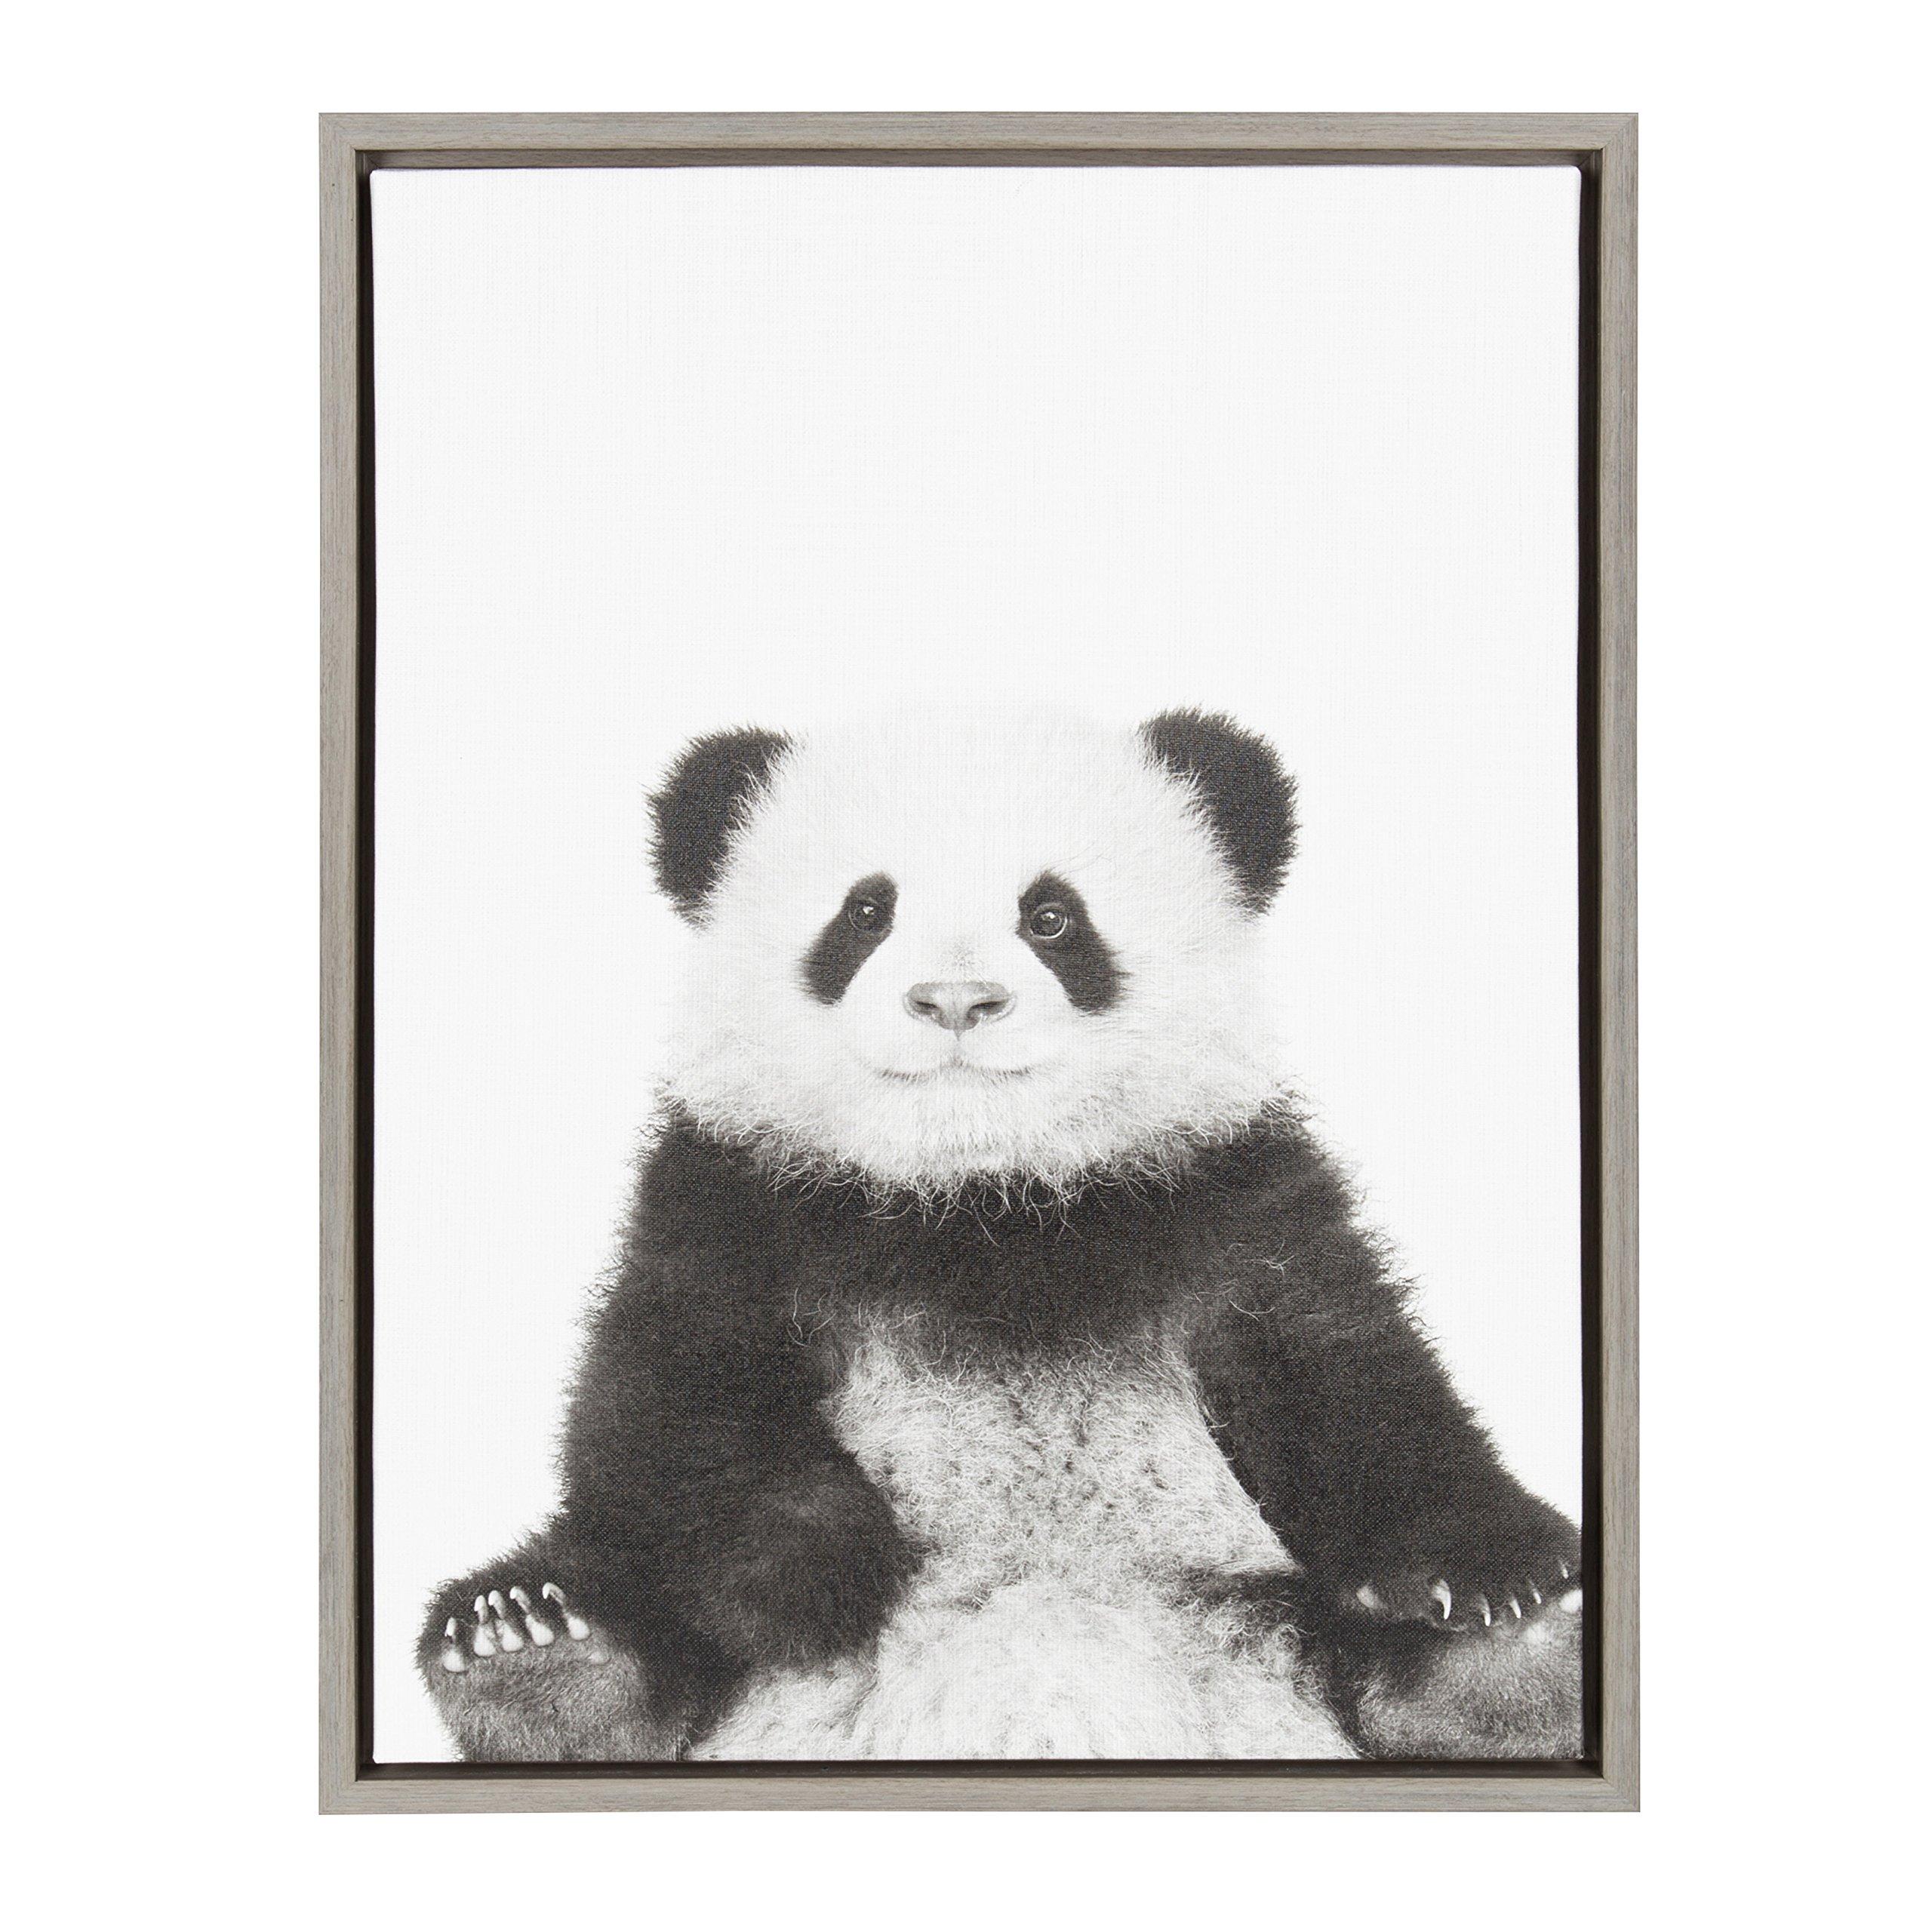 Kate and Laurel Sylvie Panda Animal Print Black and White Portrait Framed Canvas Wall Art by Simon Te Tai, Gray 18x24